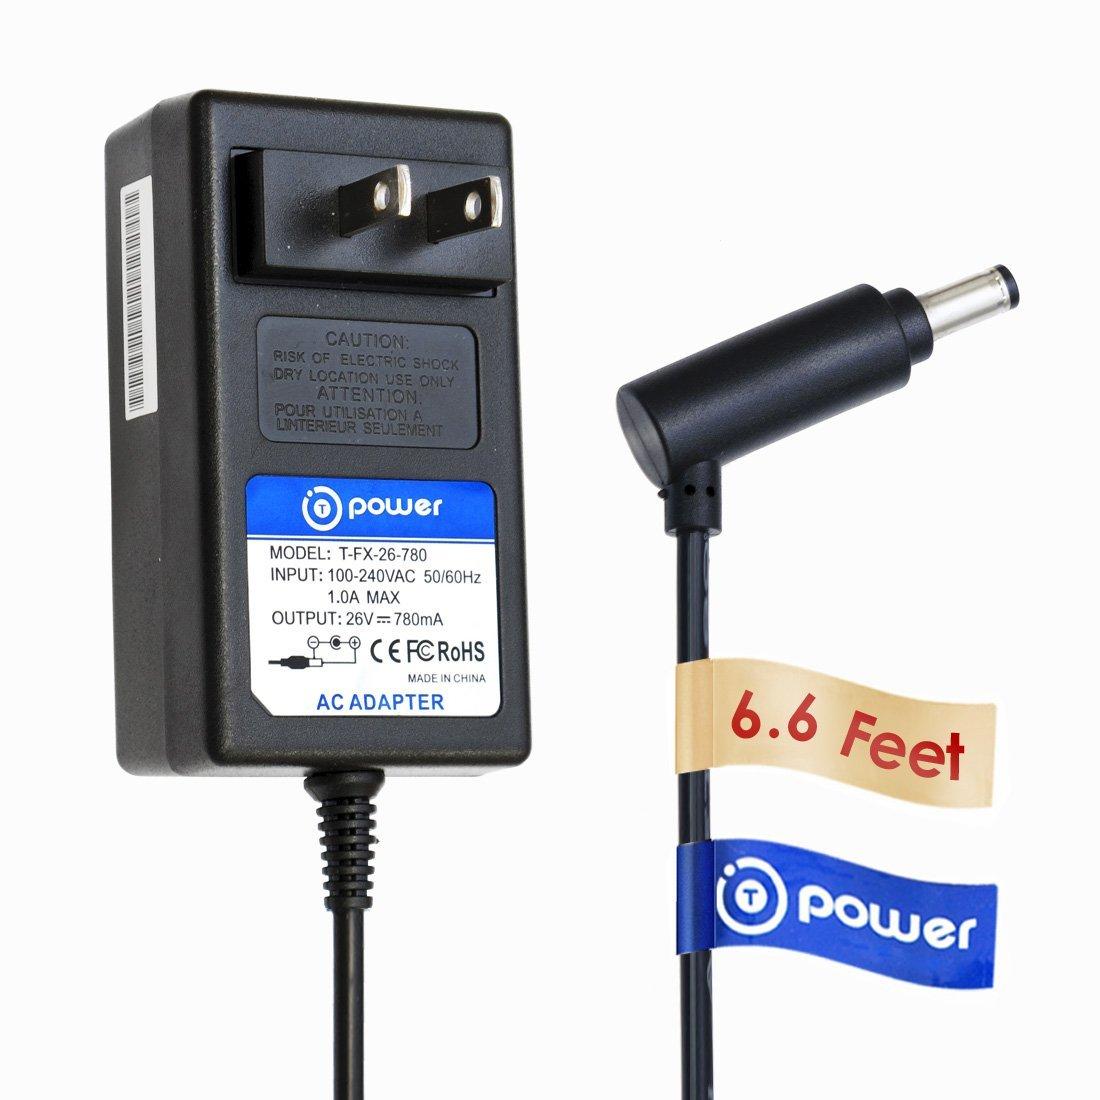 T POWER 26V Ac Dc Adapter Charger for Dyson V6 V7 V8 DC58, DC59, DC60, DC61, DC62, DC72 SV03 SV05 ERP SV06 Cord Free Handhelds Stick Vacuum Power Supply